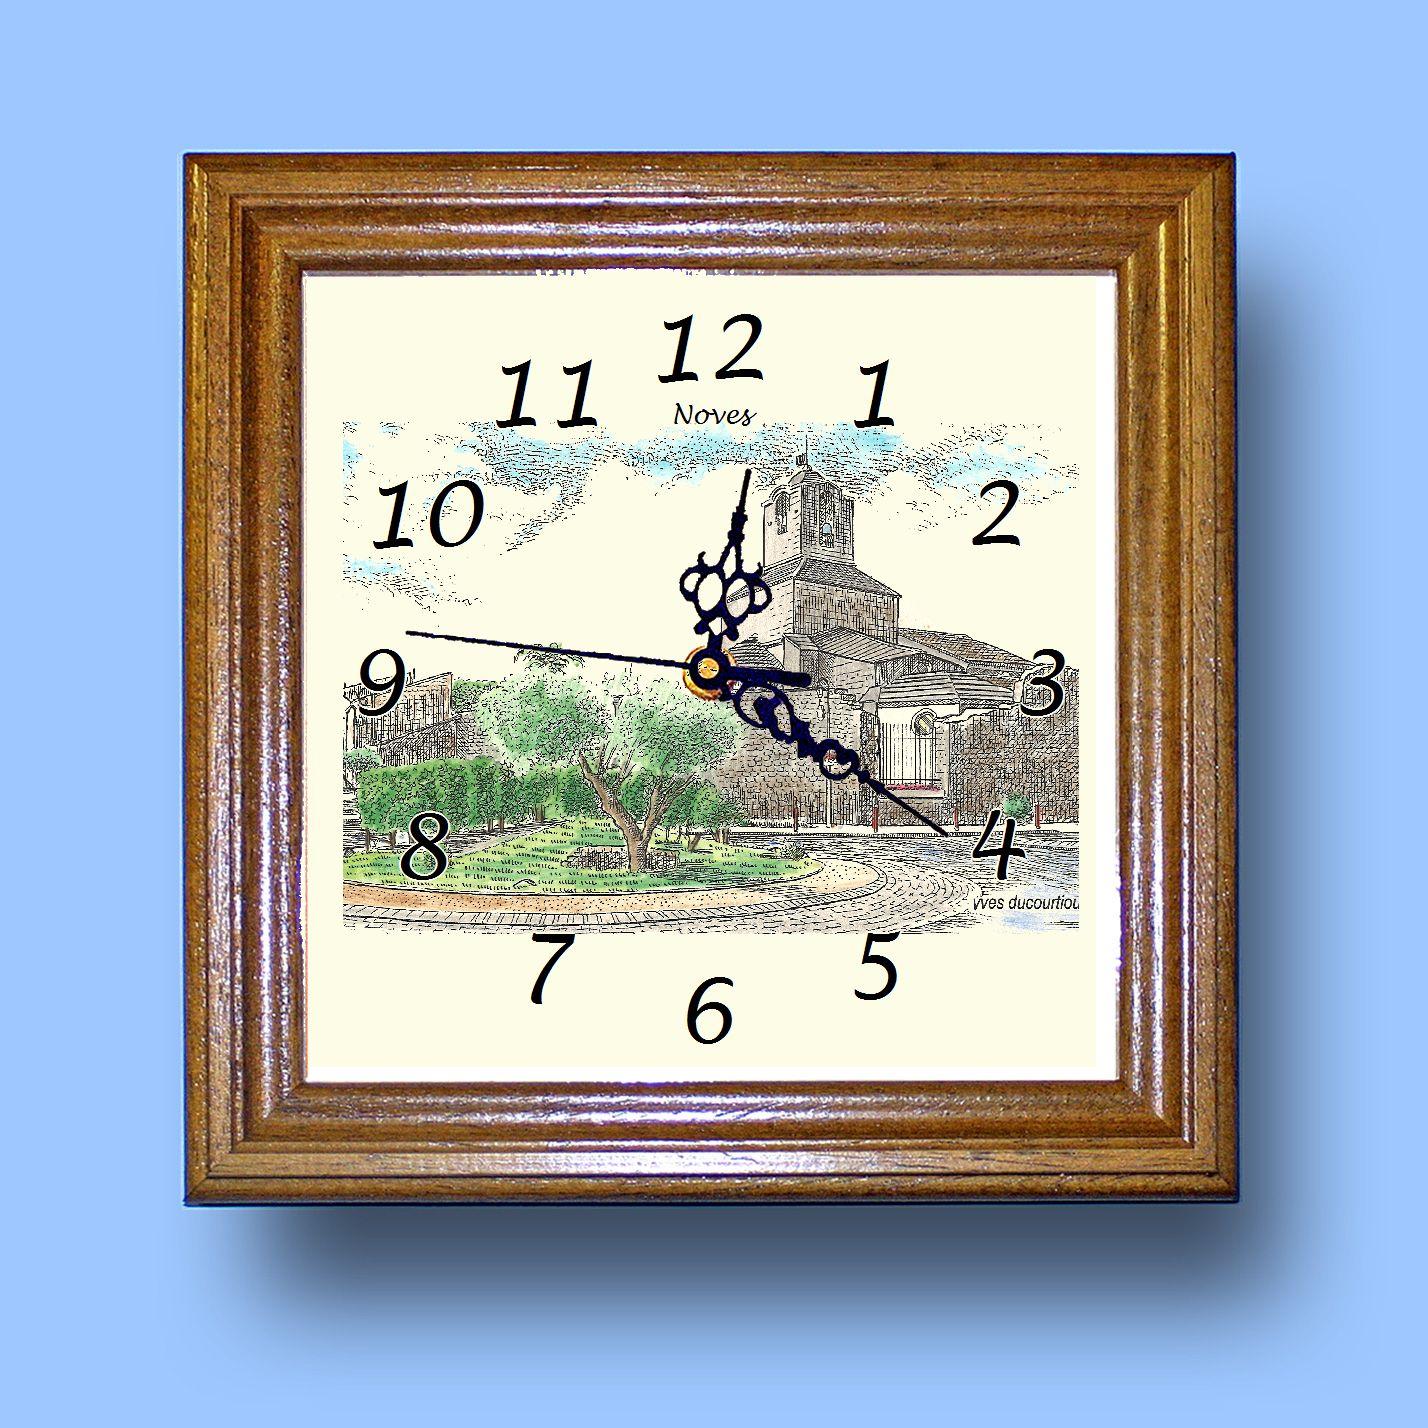 HG CL 13308 - Horloge avec une vue de 13 NOVES 4fgT9AAT-08025736-639962151